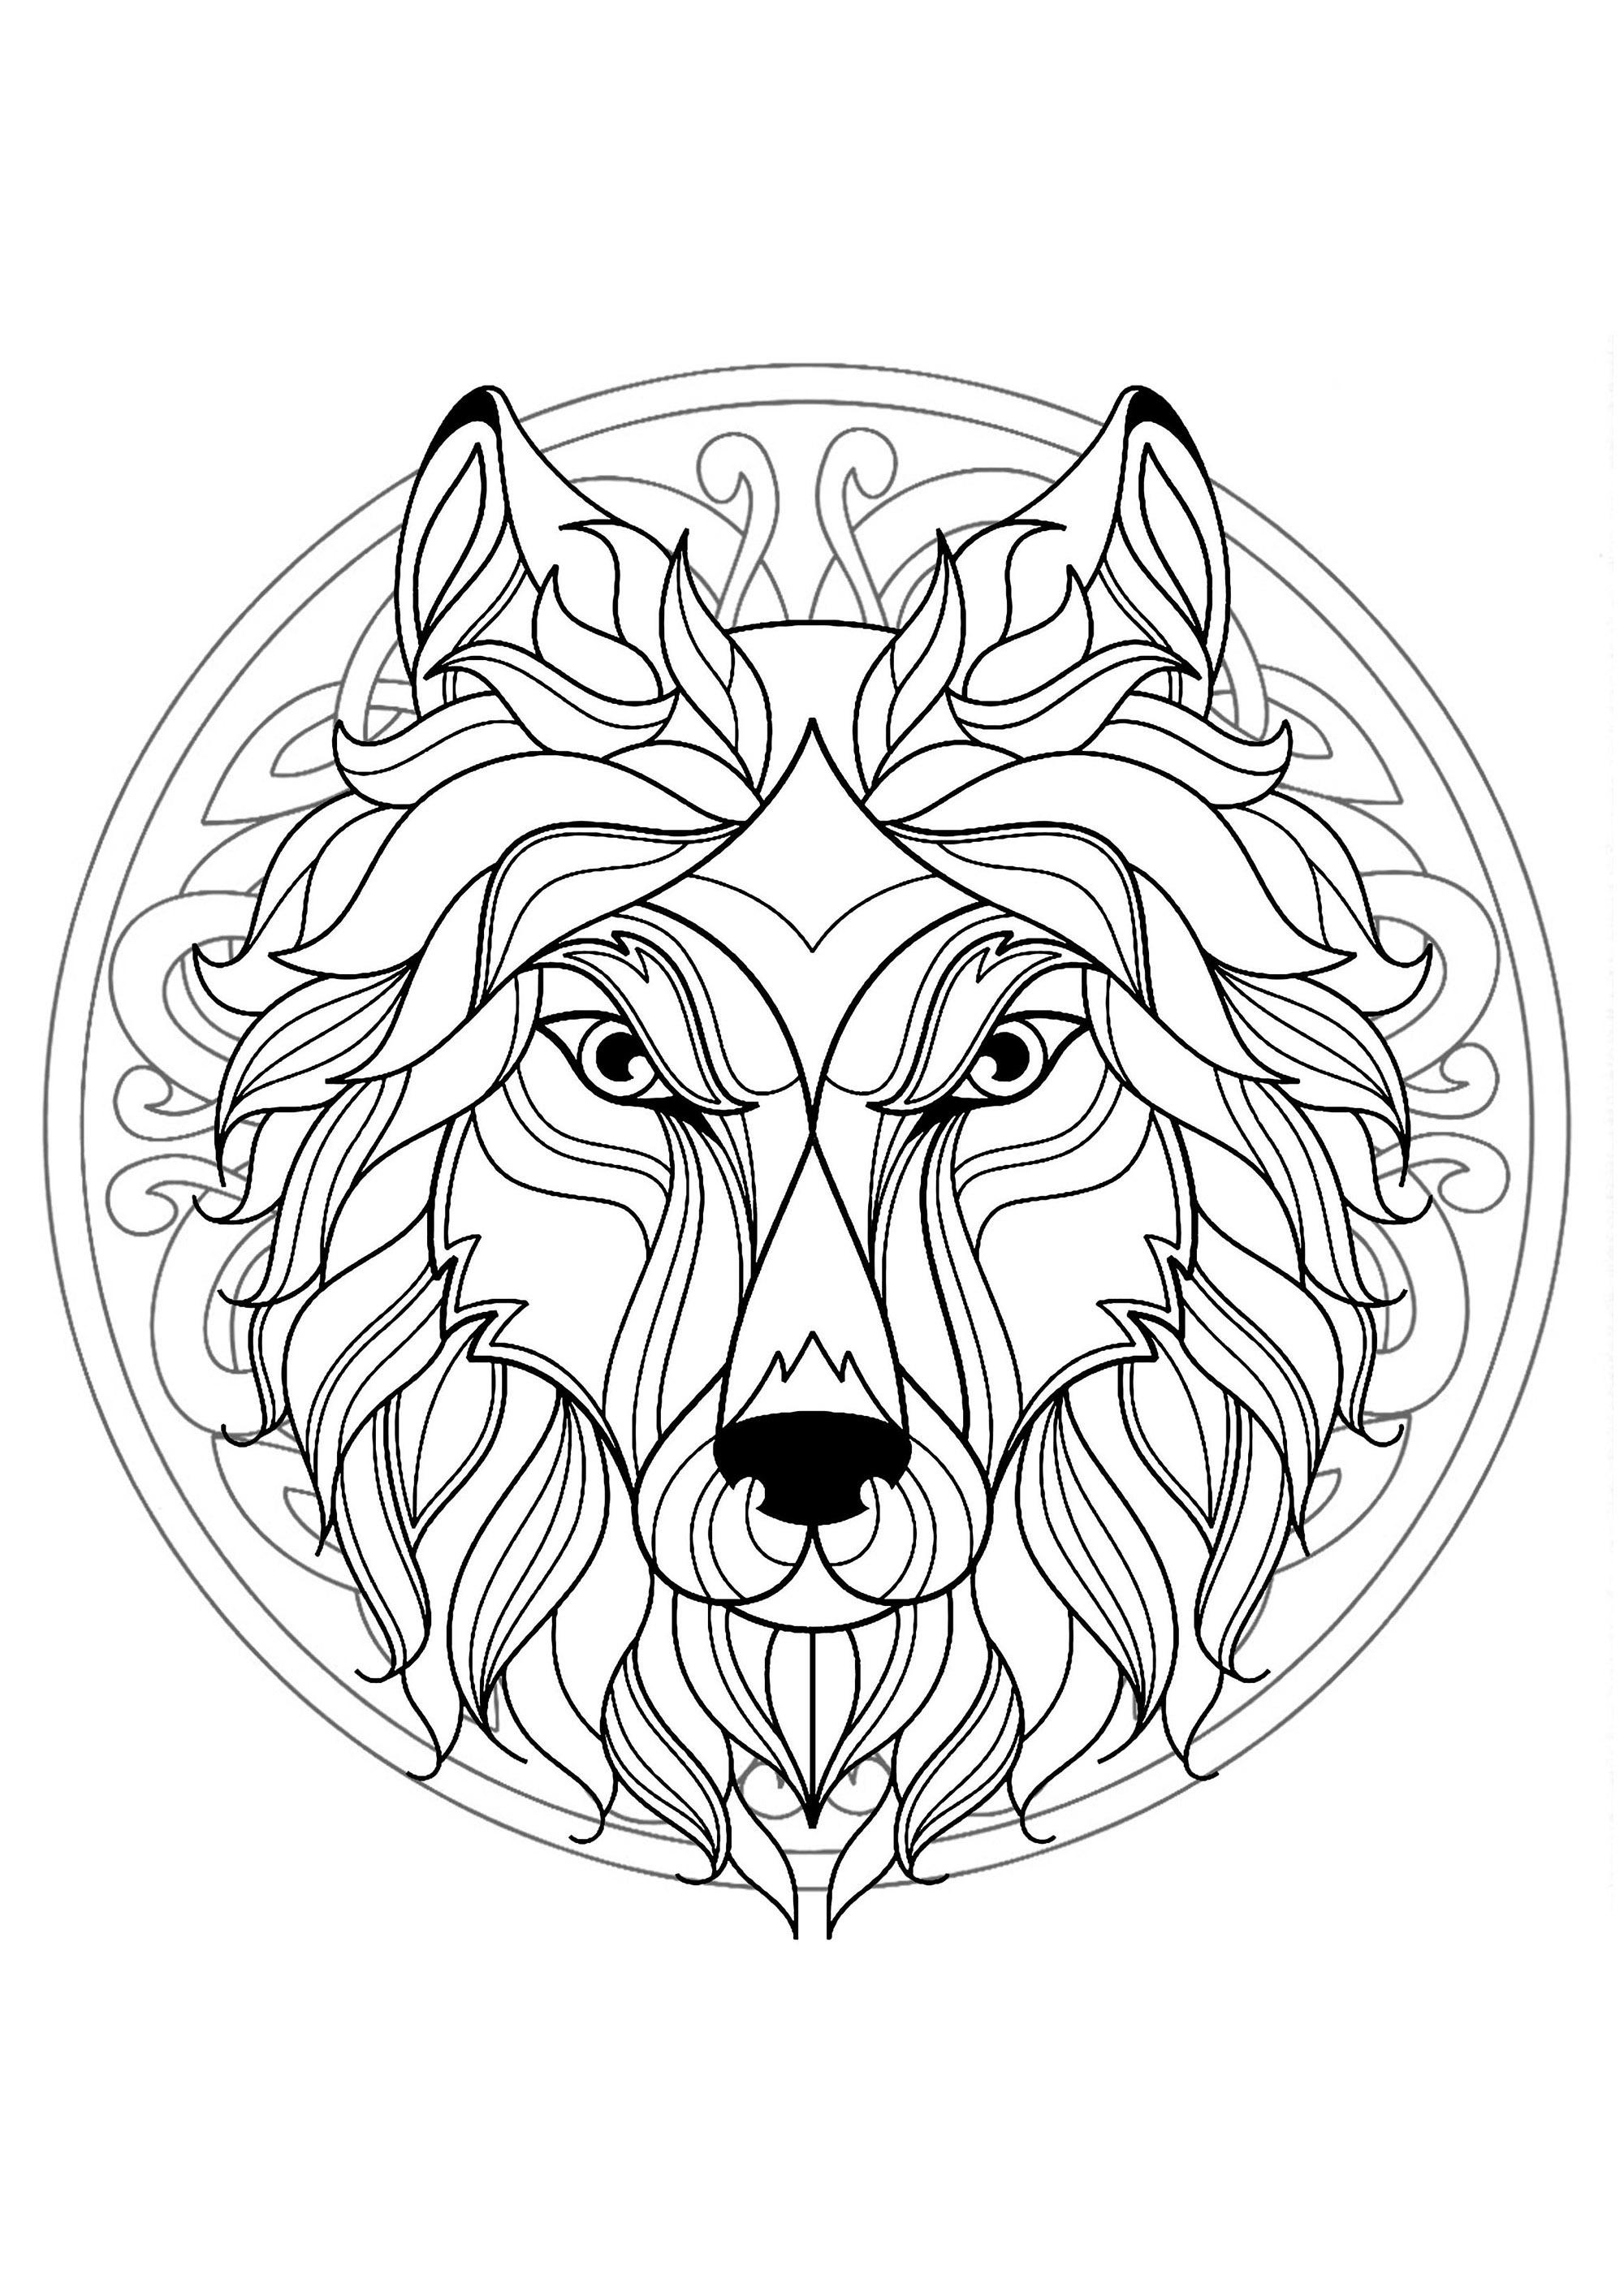 Mandalas 7387 mandalas disegni da colorare per adulti - Arte celtica colorare le pagine da colorare ...